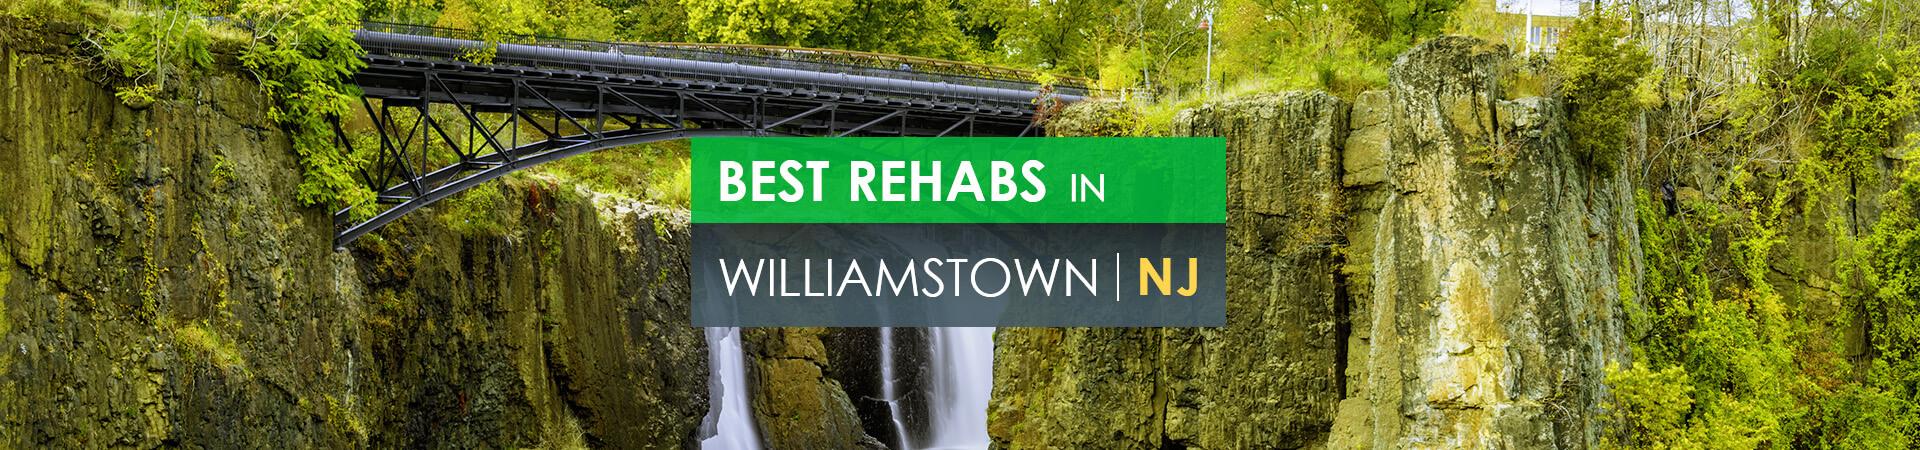 Best rehabs in Williamstown, NJ